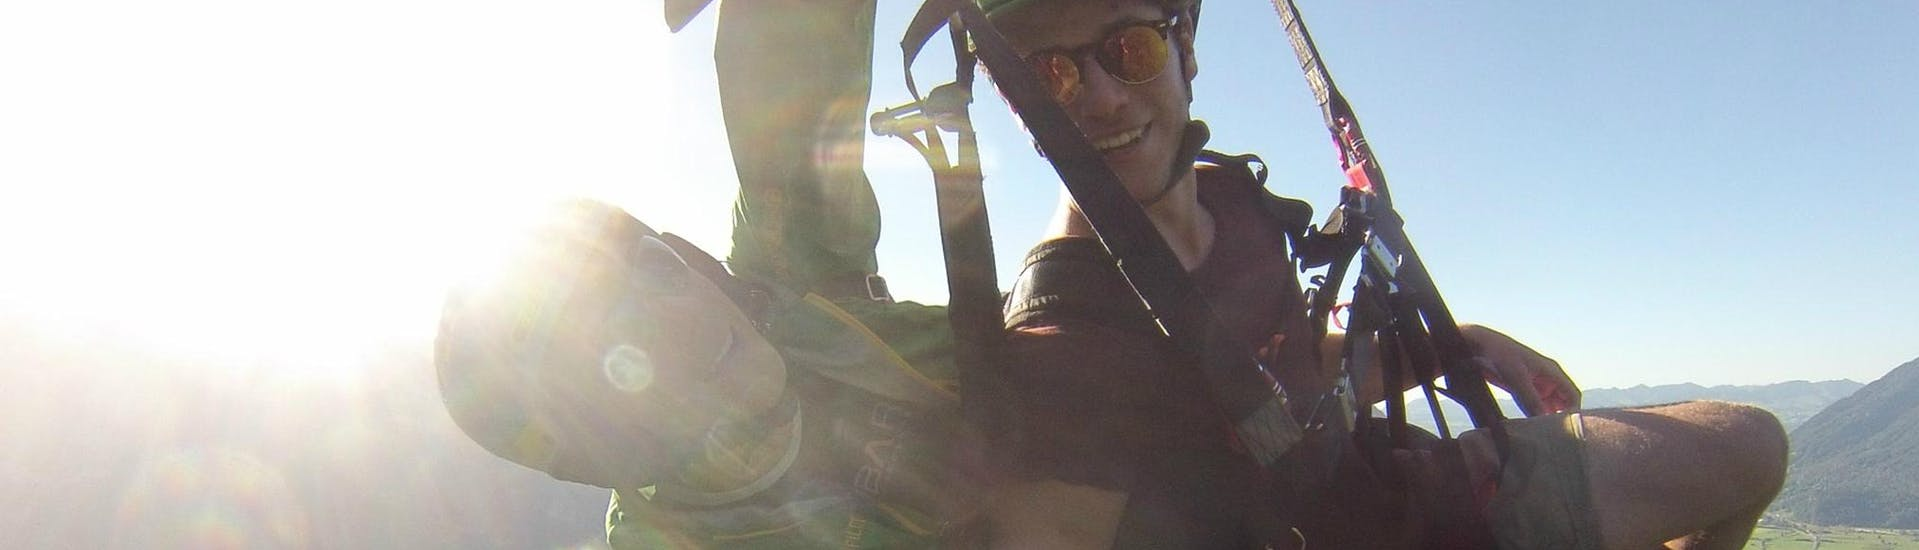 Tandem Paragliding in the Glarnerland & Walensee - Big Air